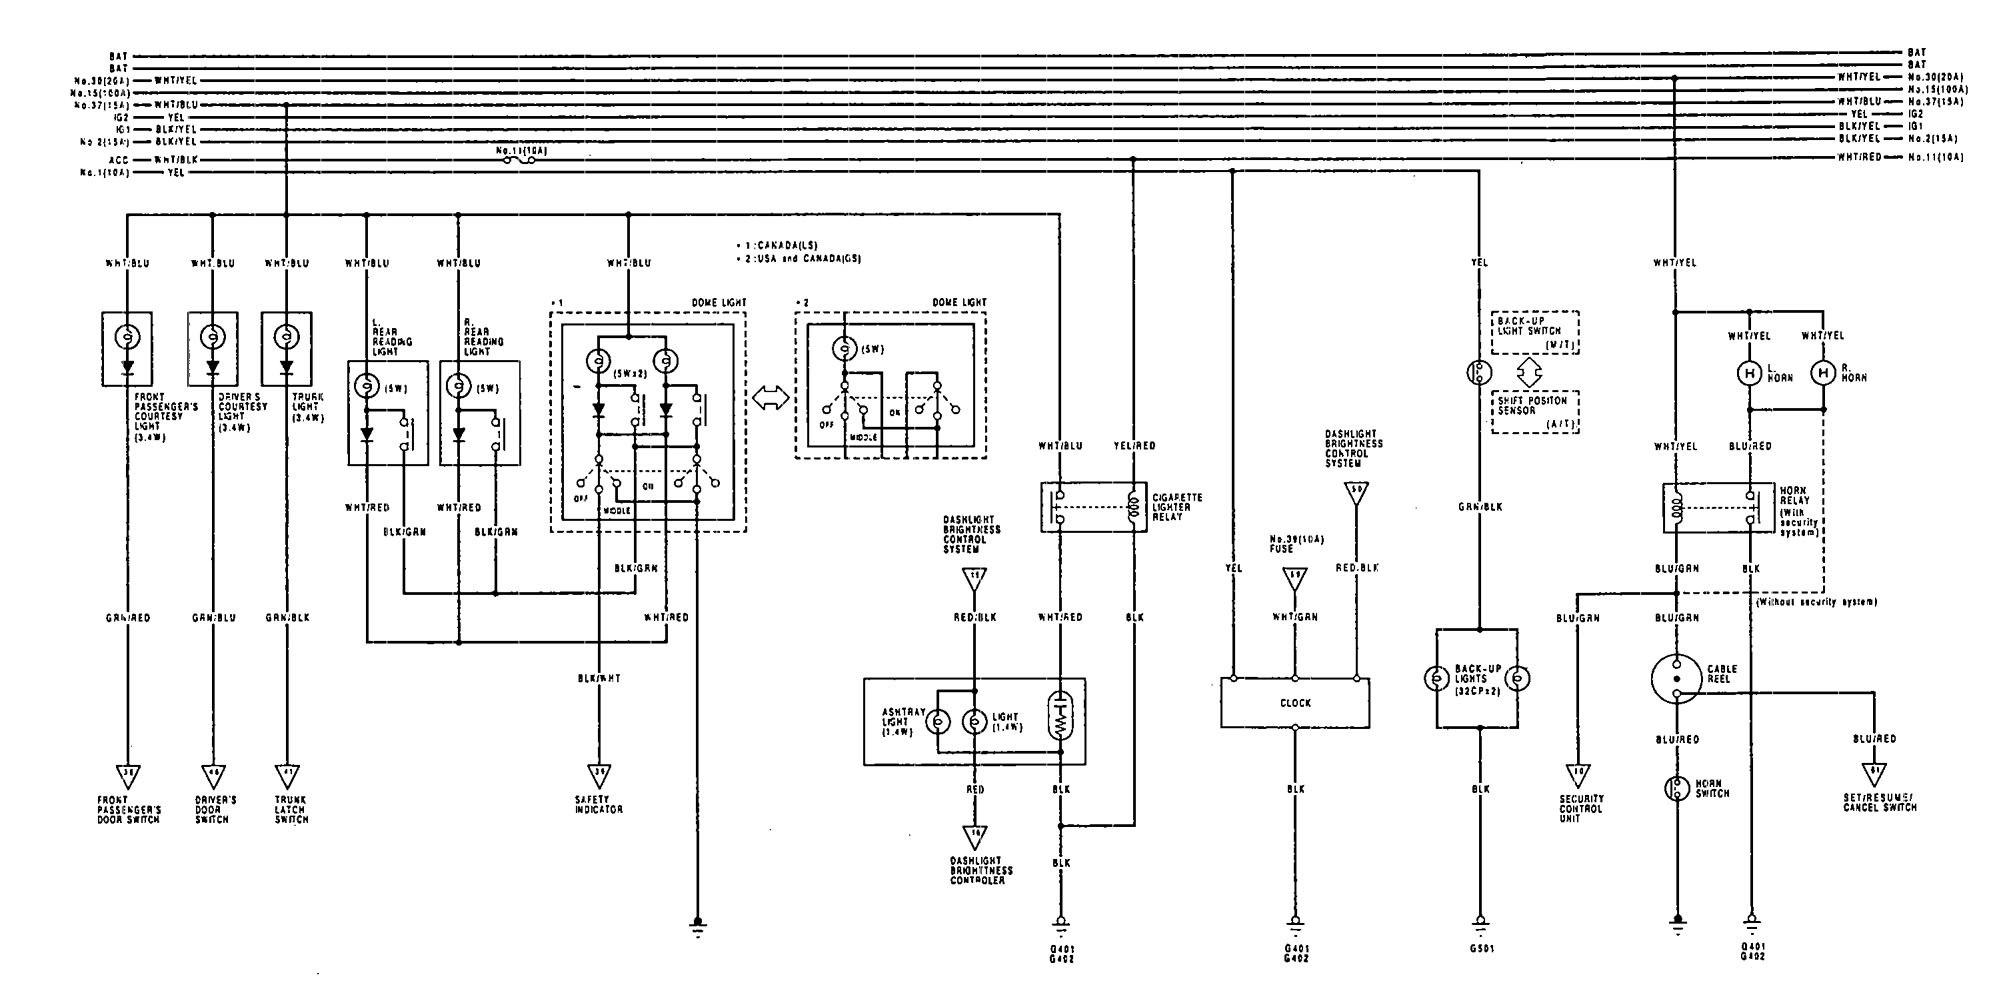 Acura Vigor  1992  - Wiring Diagrams - Clock